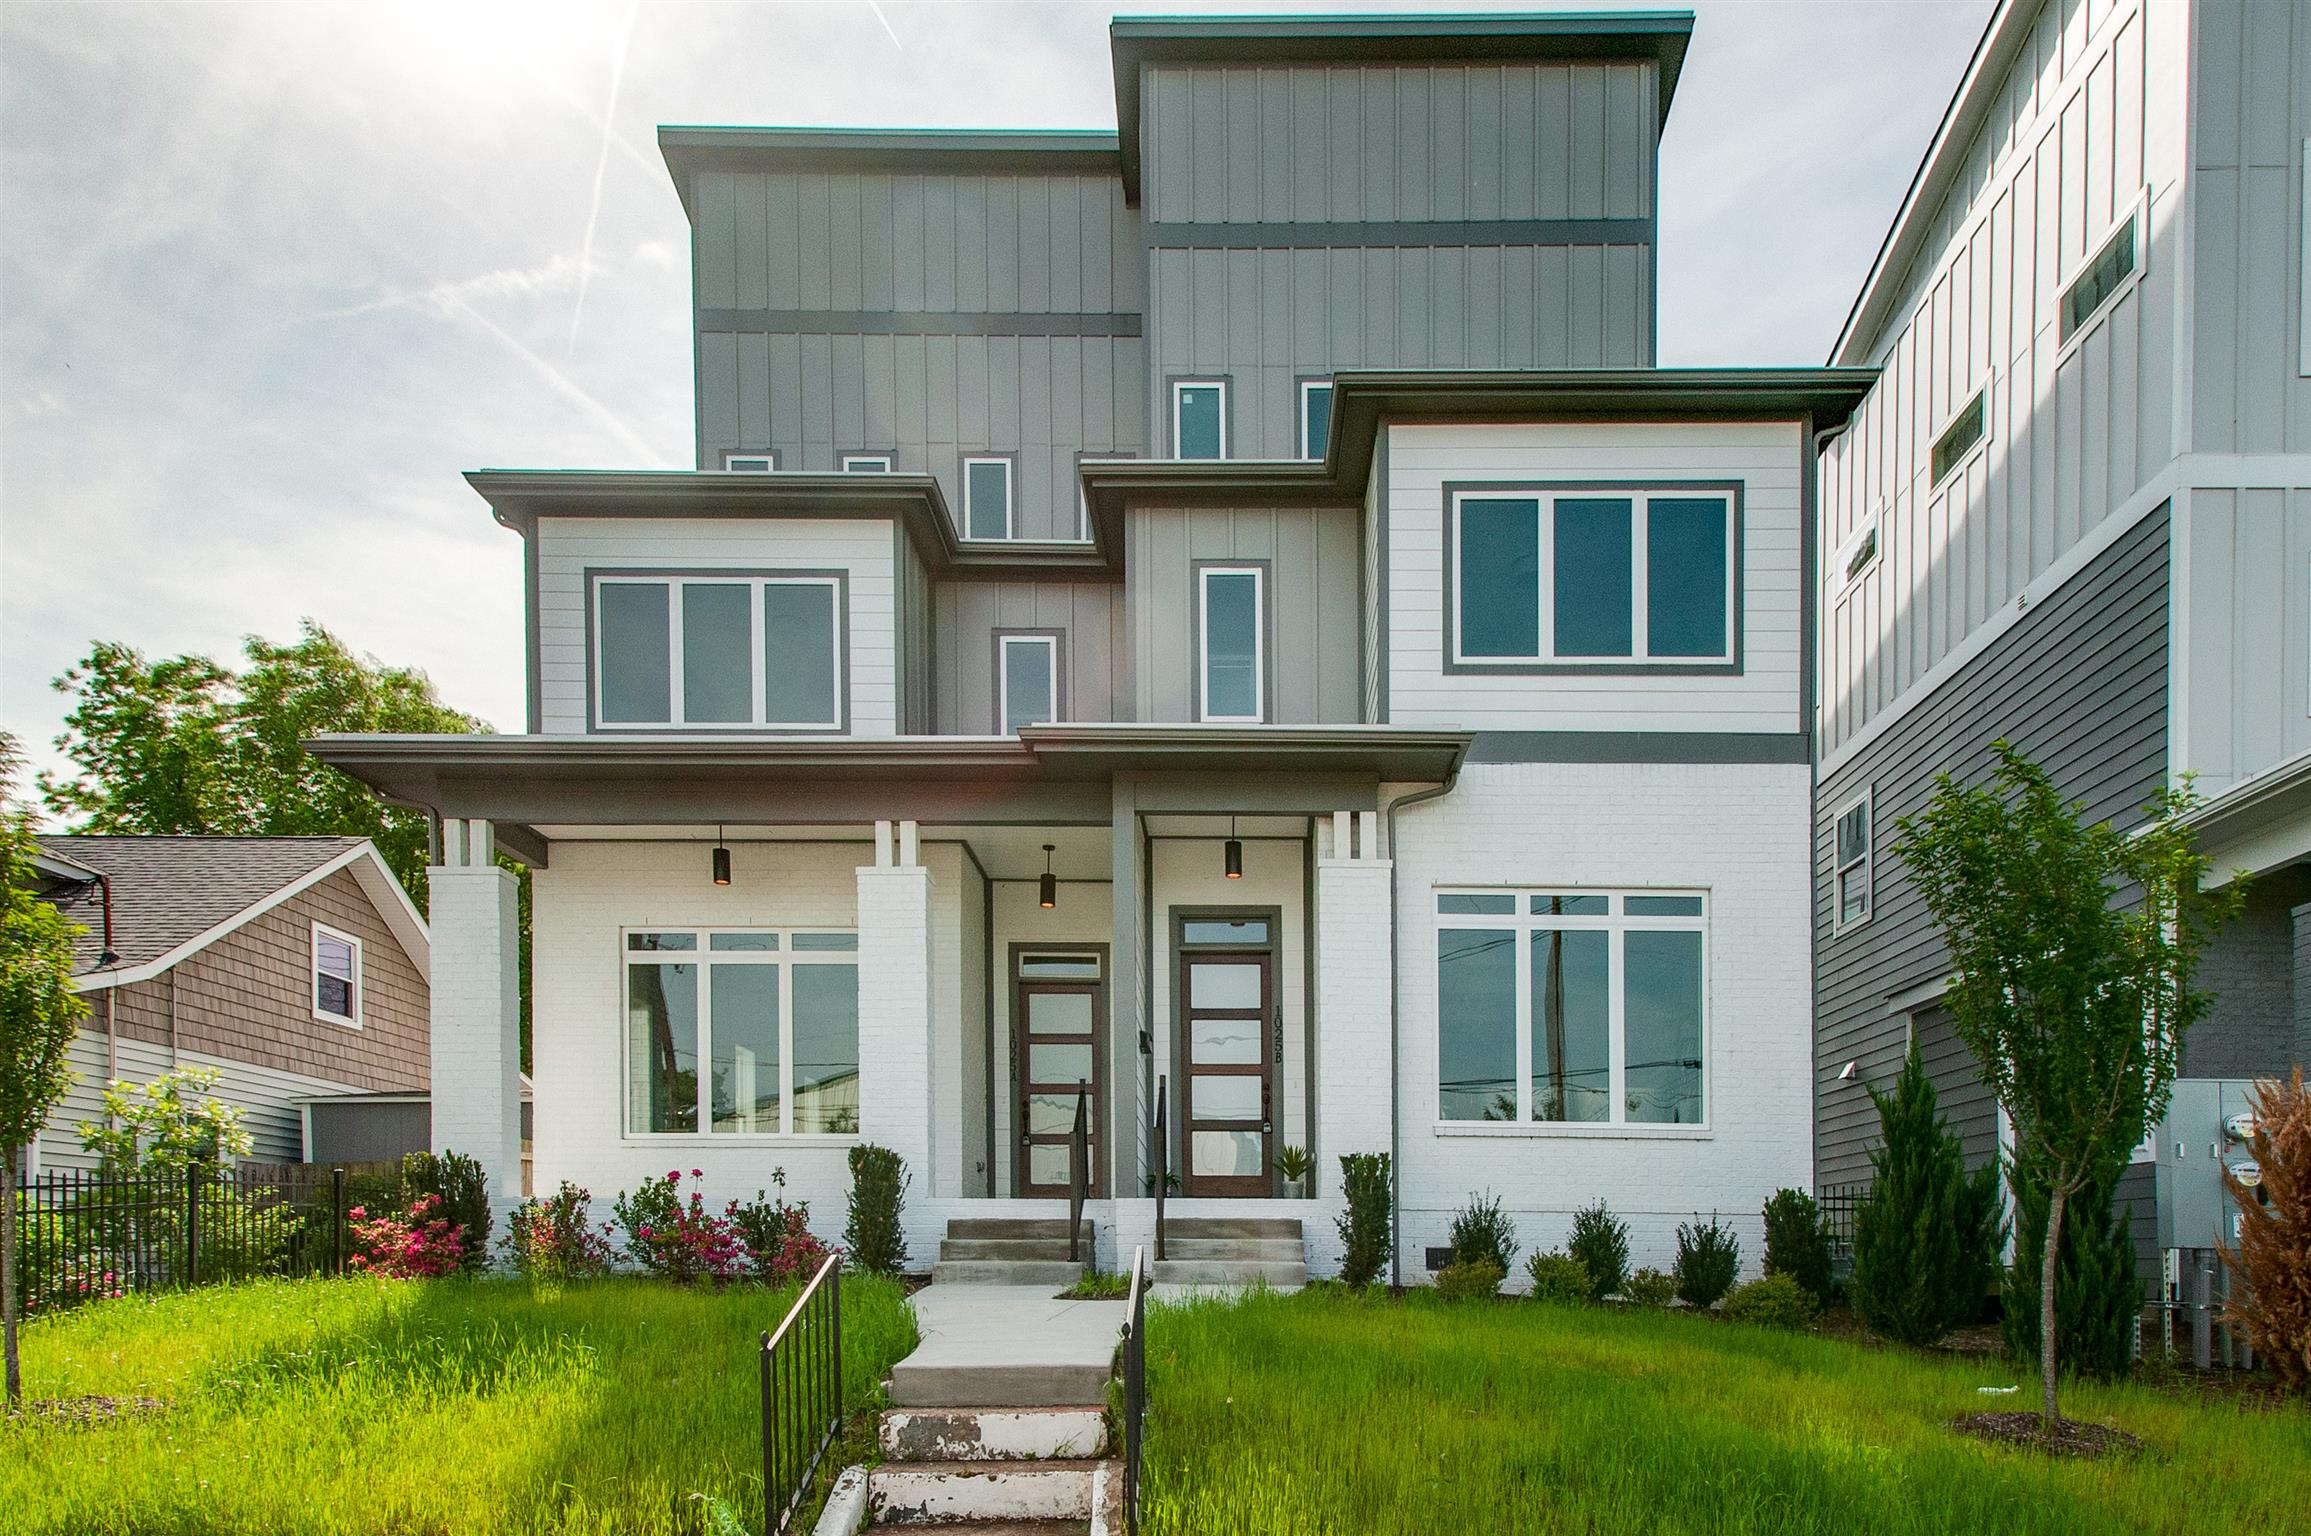 1025A Cheatham Pl, Nashville, TN 37208 - Nashville, TN real estate listing